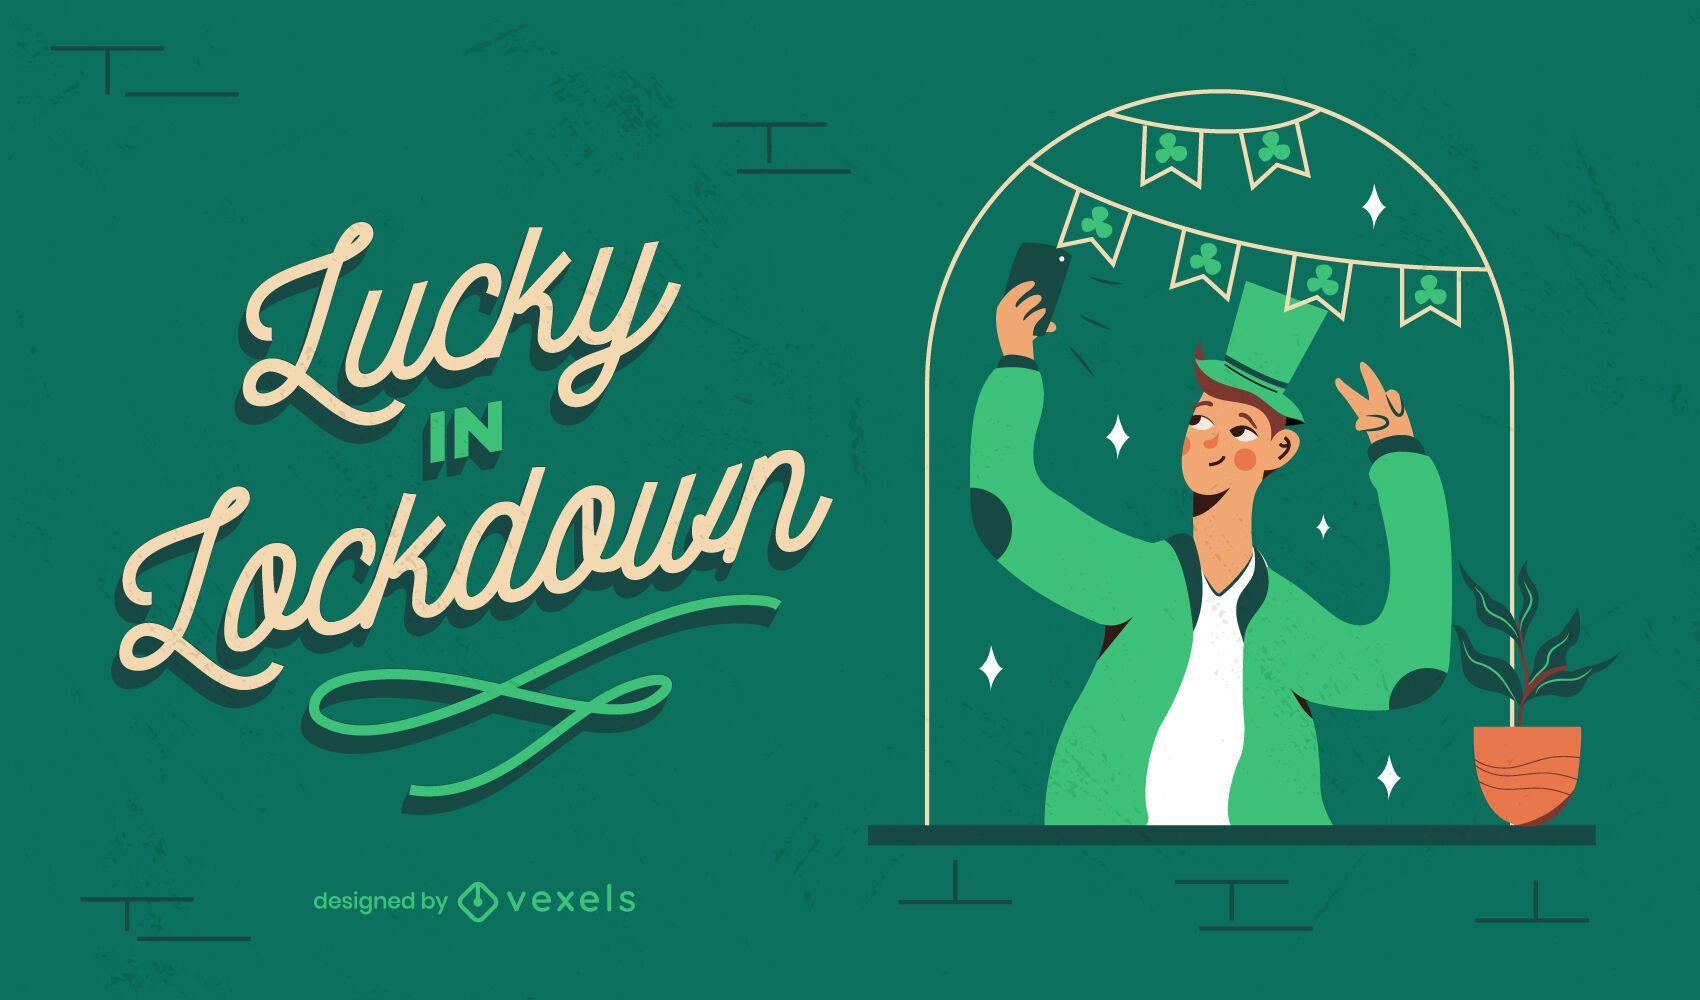 Lucky in lockdown illustration design